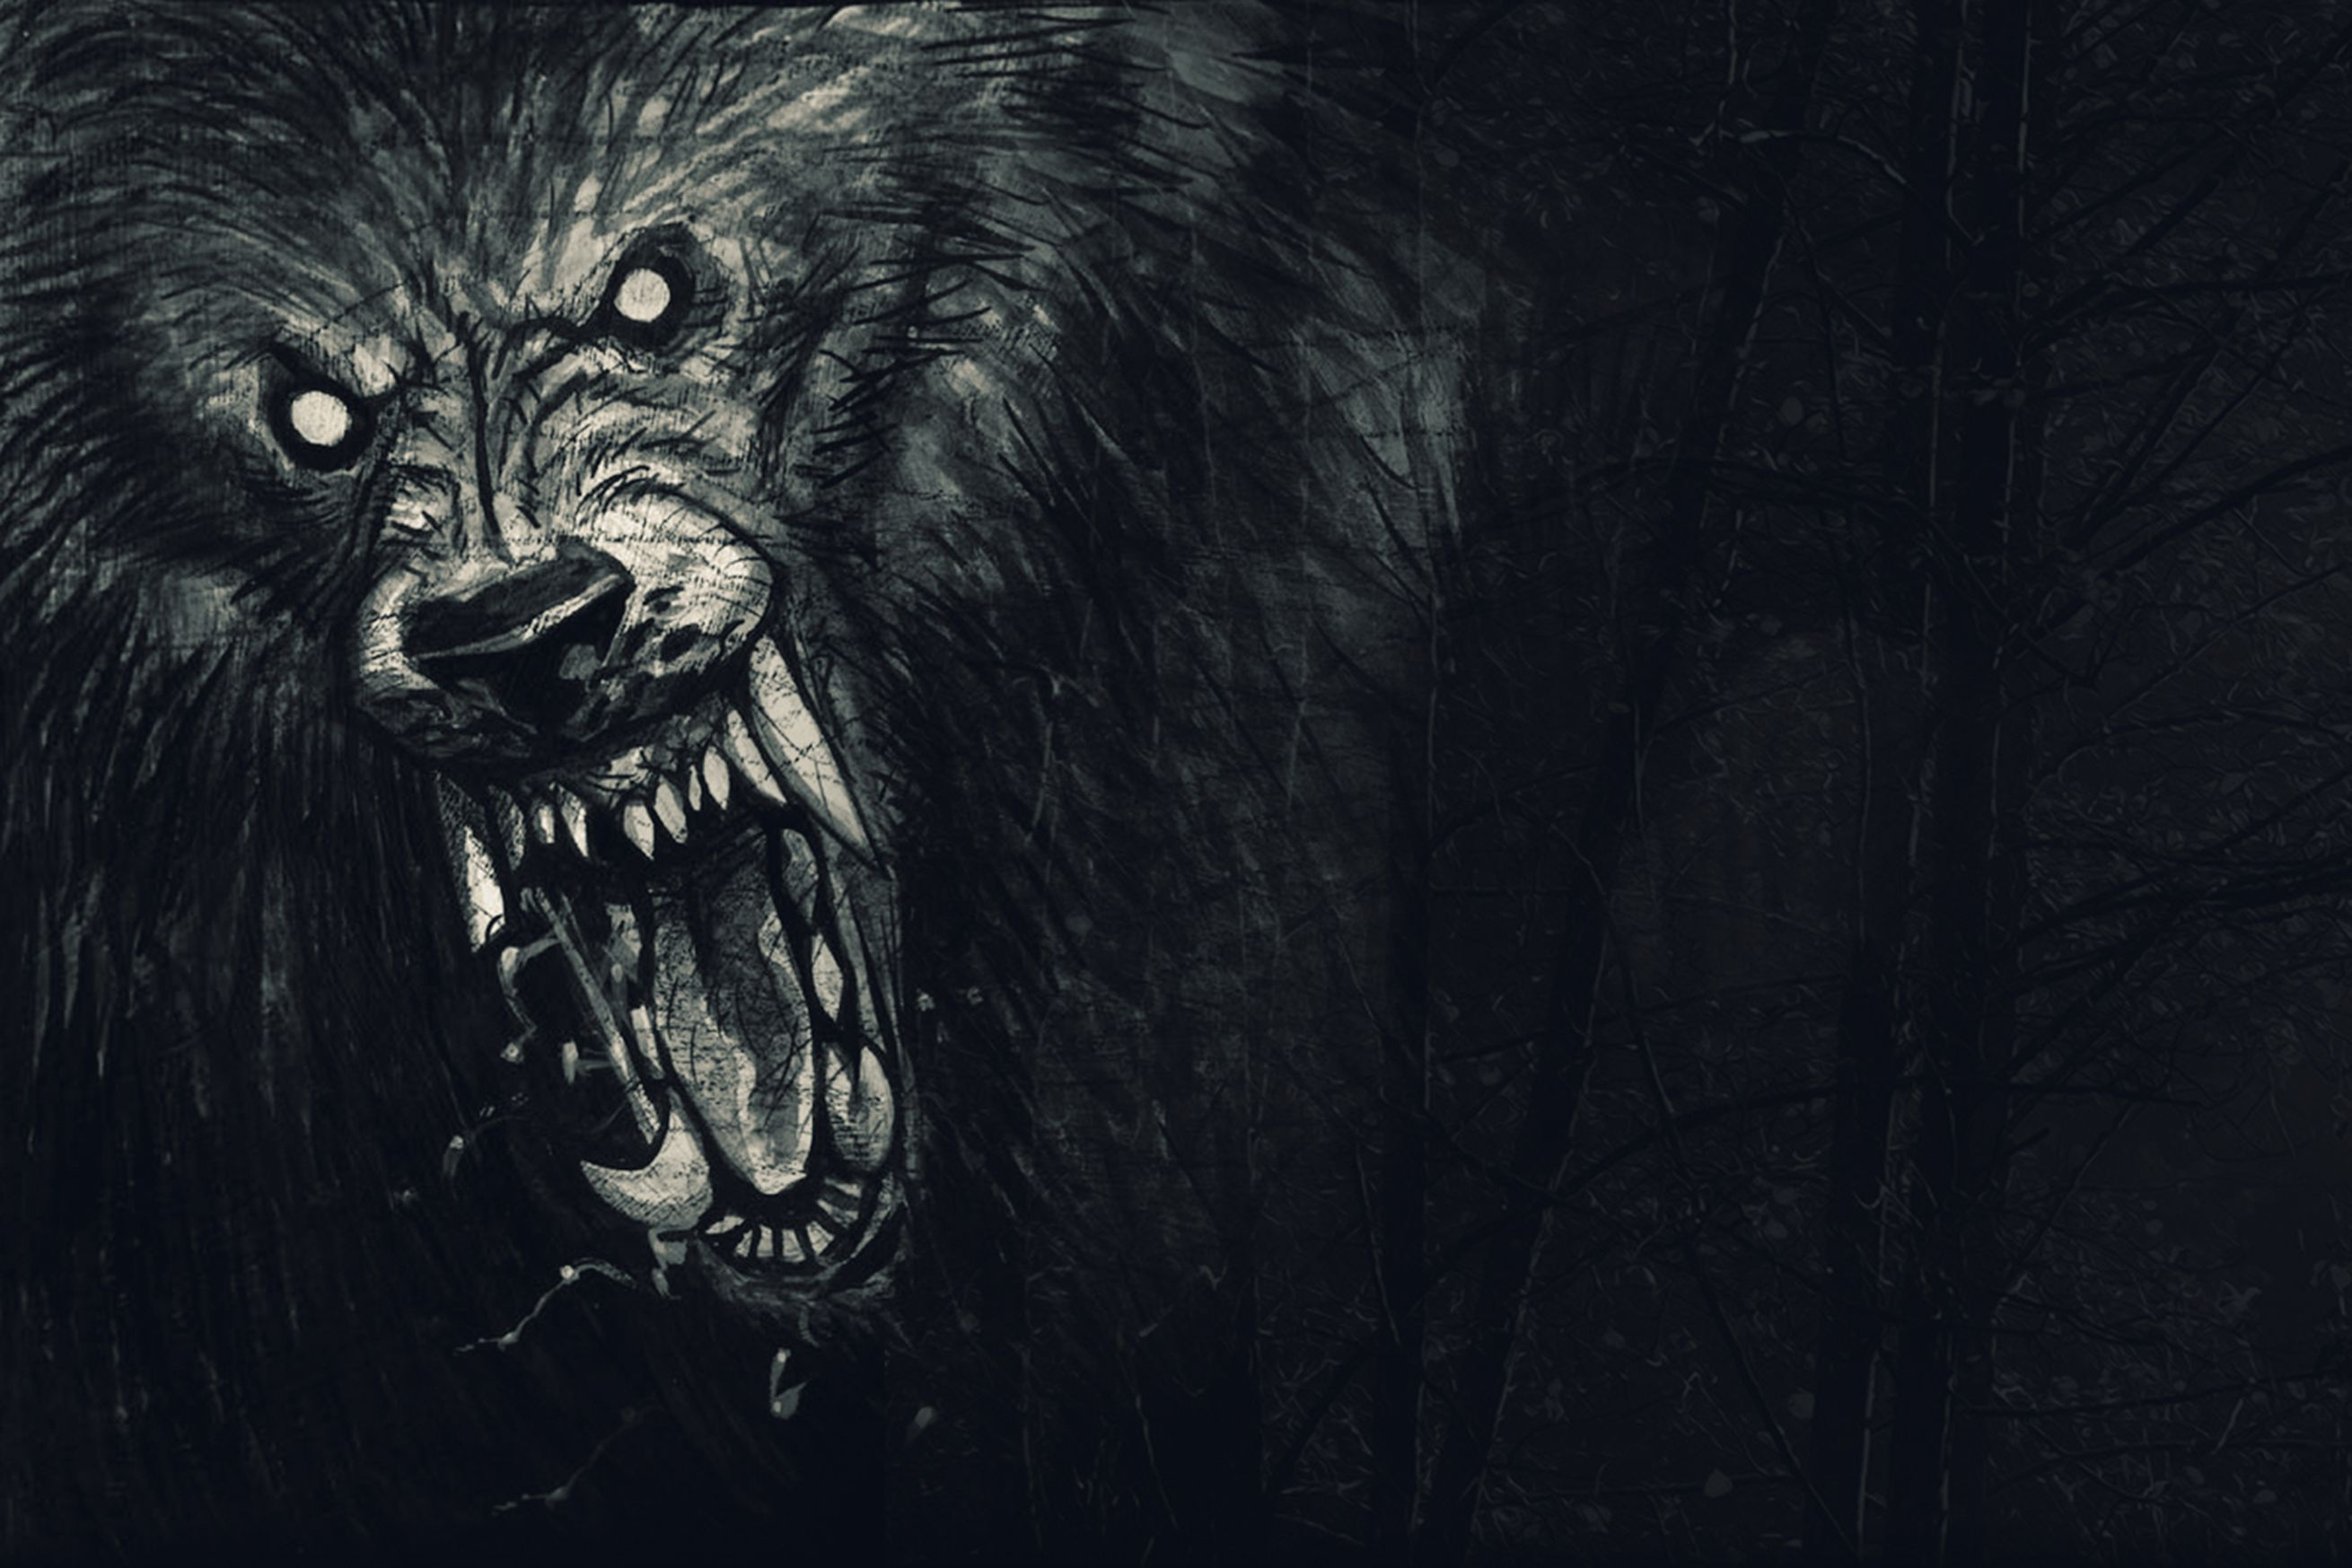 Wampire Moon Wallpaper Desktop 3d Werewolf The Apocalypse Announced For Pc And Consoles